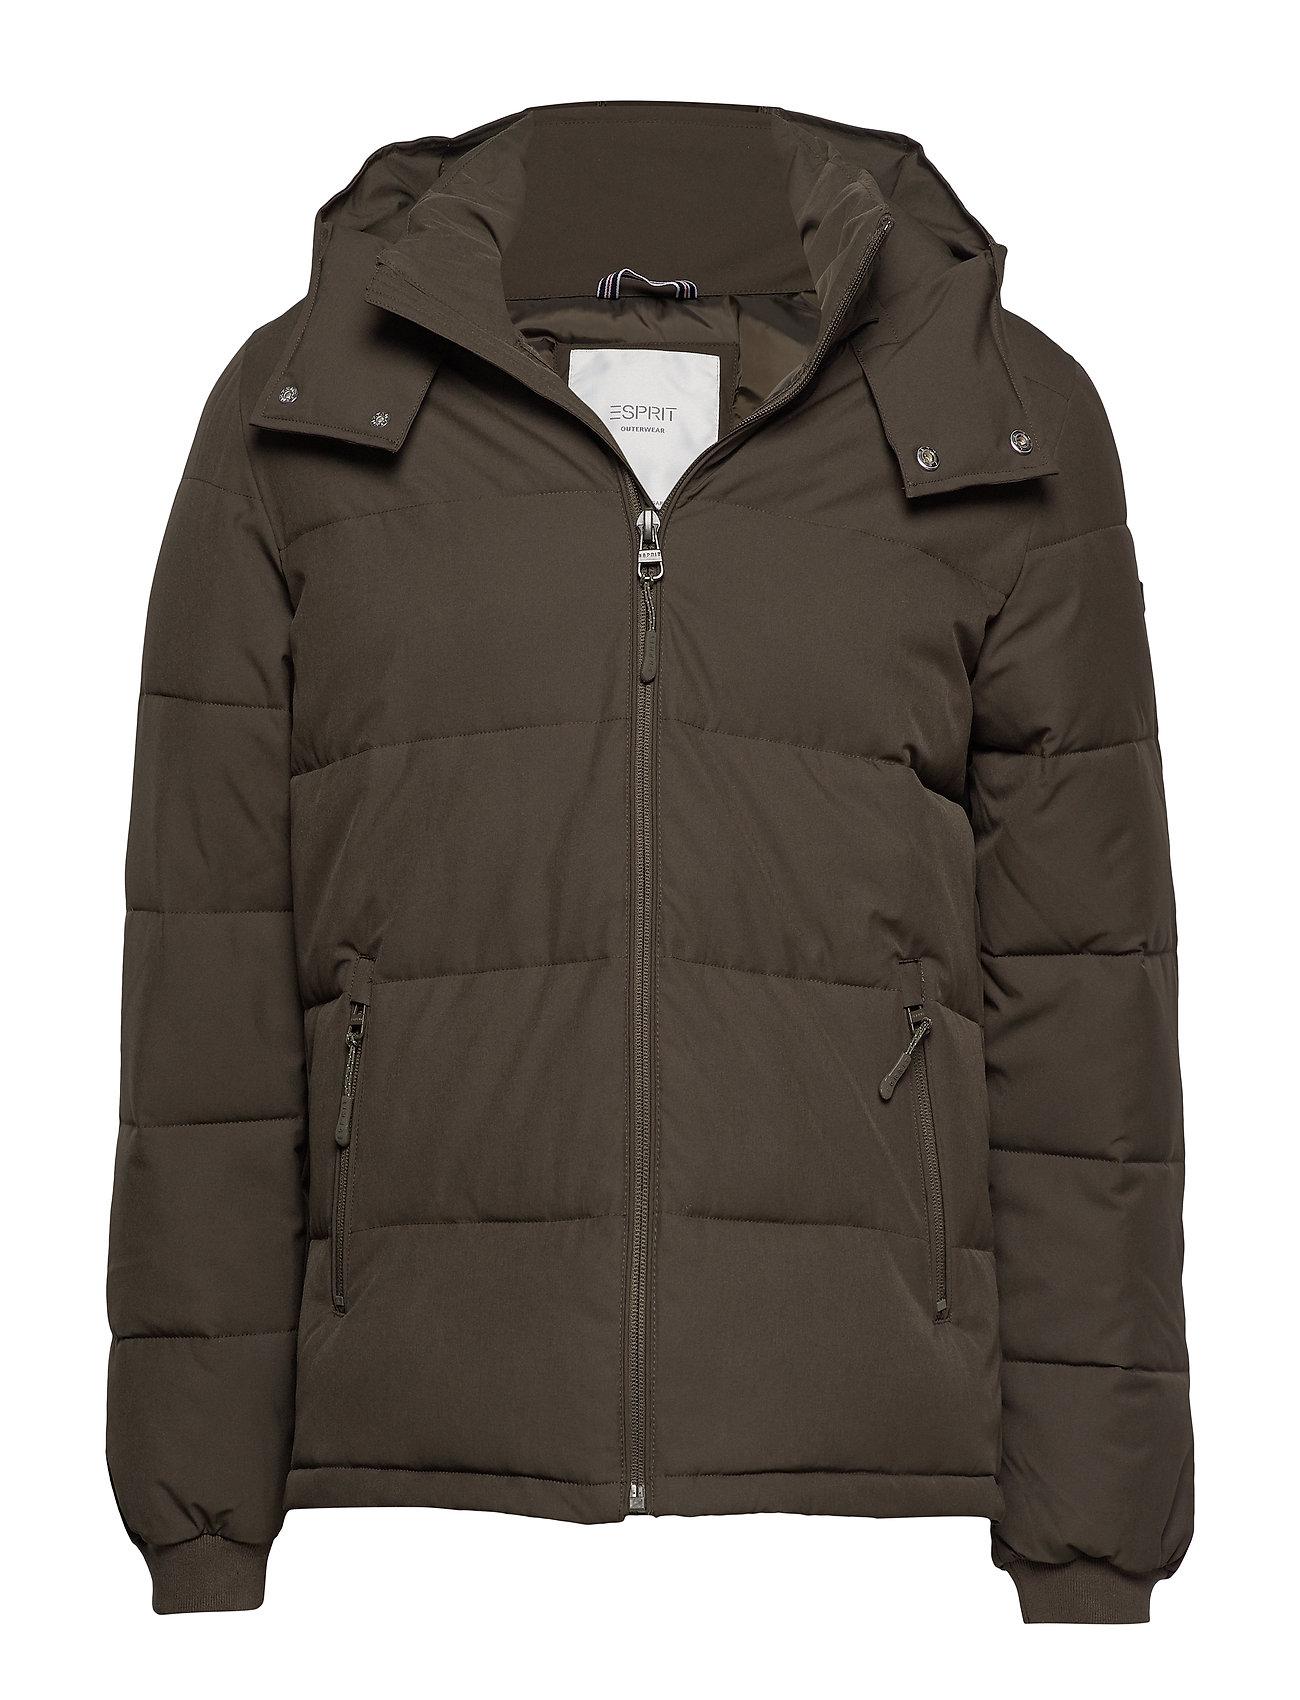 ESPRIT Jackets Outdoor Woven Gefütterte Jacke Grün ESPRIT CASUAL